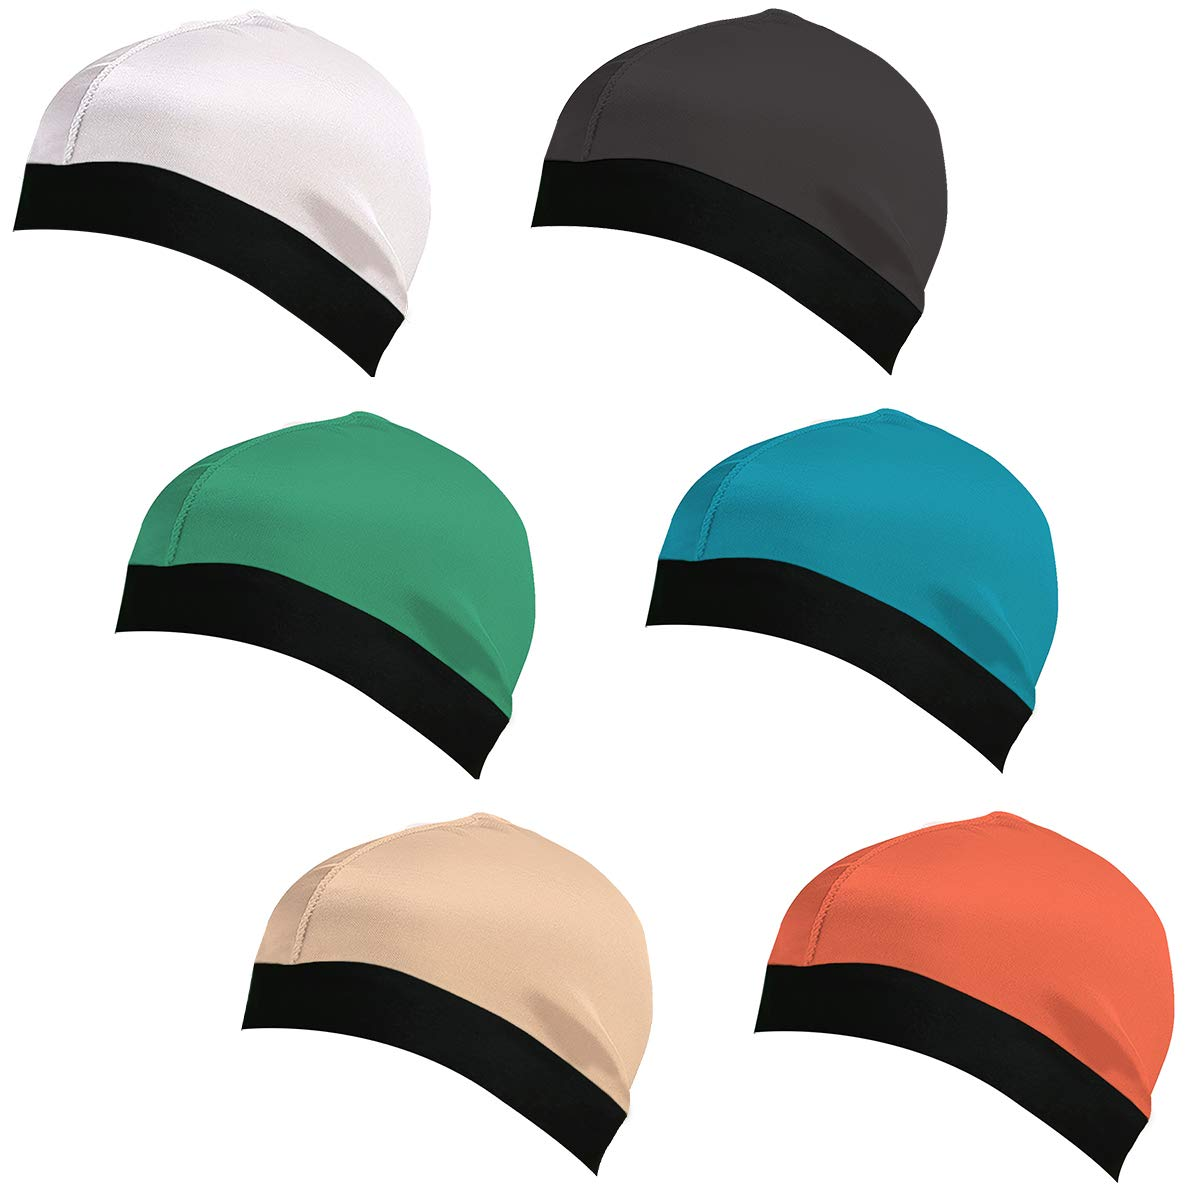 3 Pack Silky Stocking Wave Cap Sleep Cap Shower Cap Durag Base Dome Cap for Men